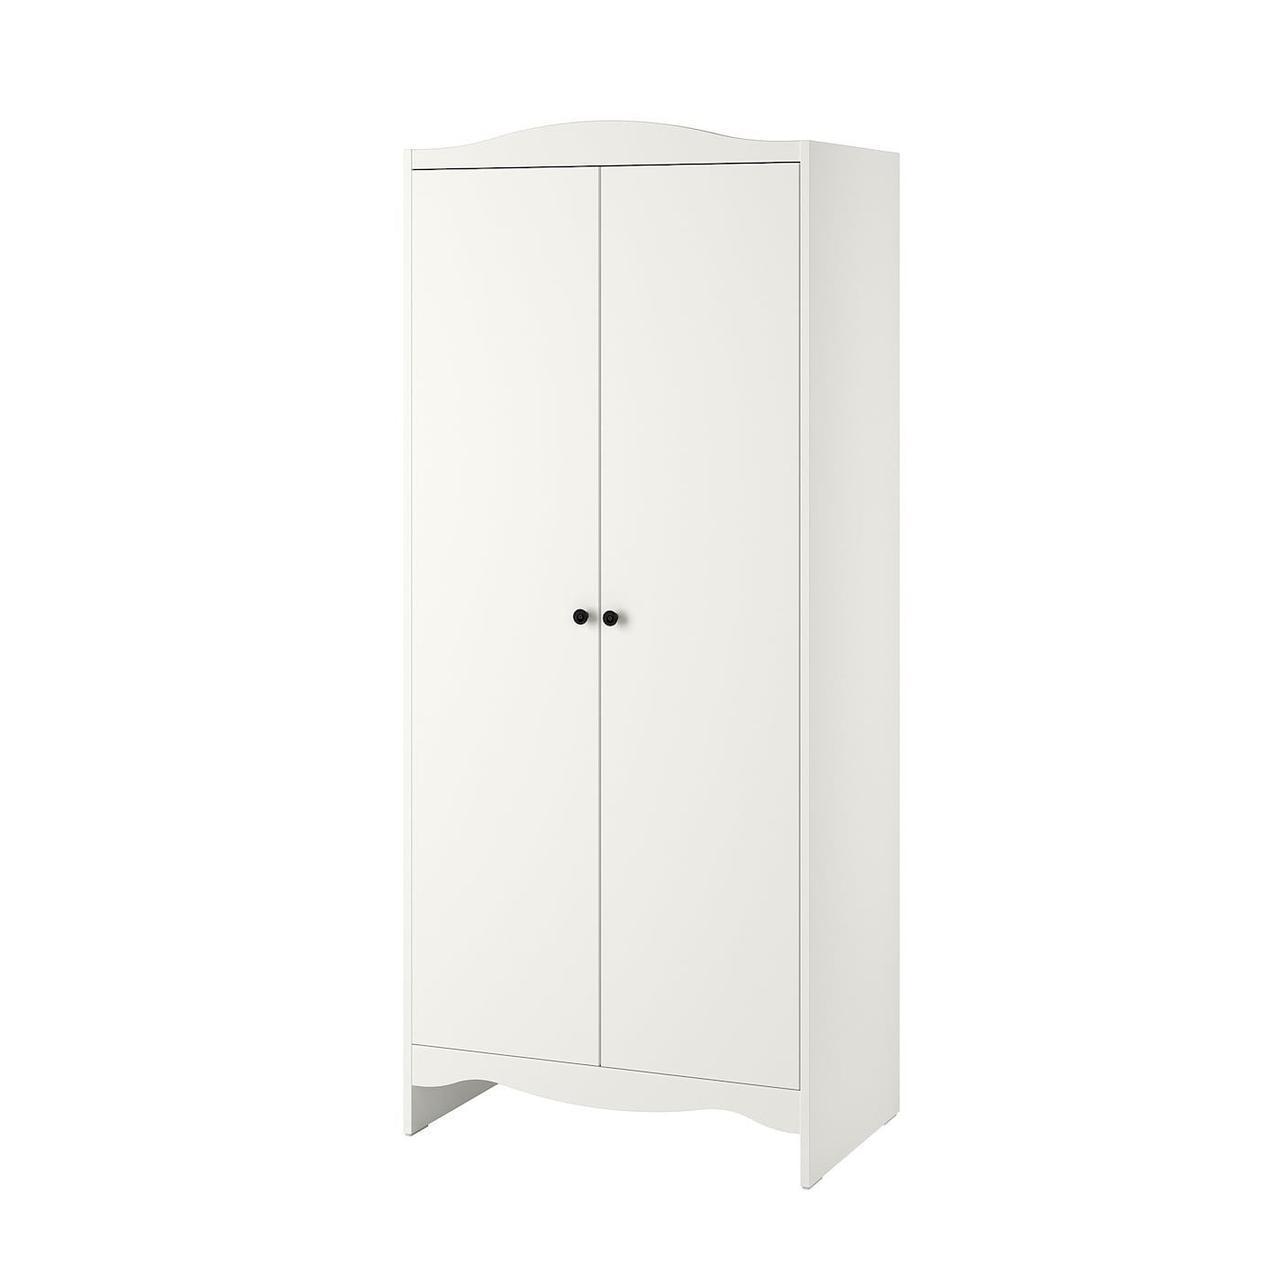 Шкаф IKEA SMÅGÖRA 104.608.88